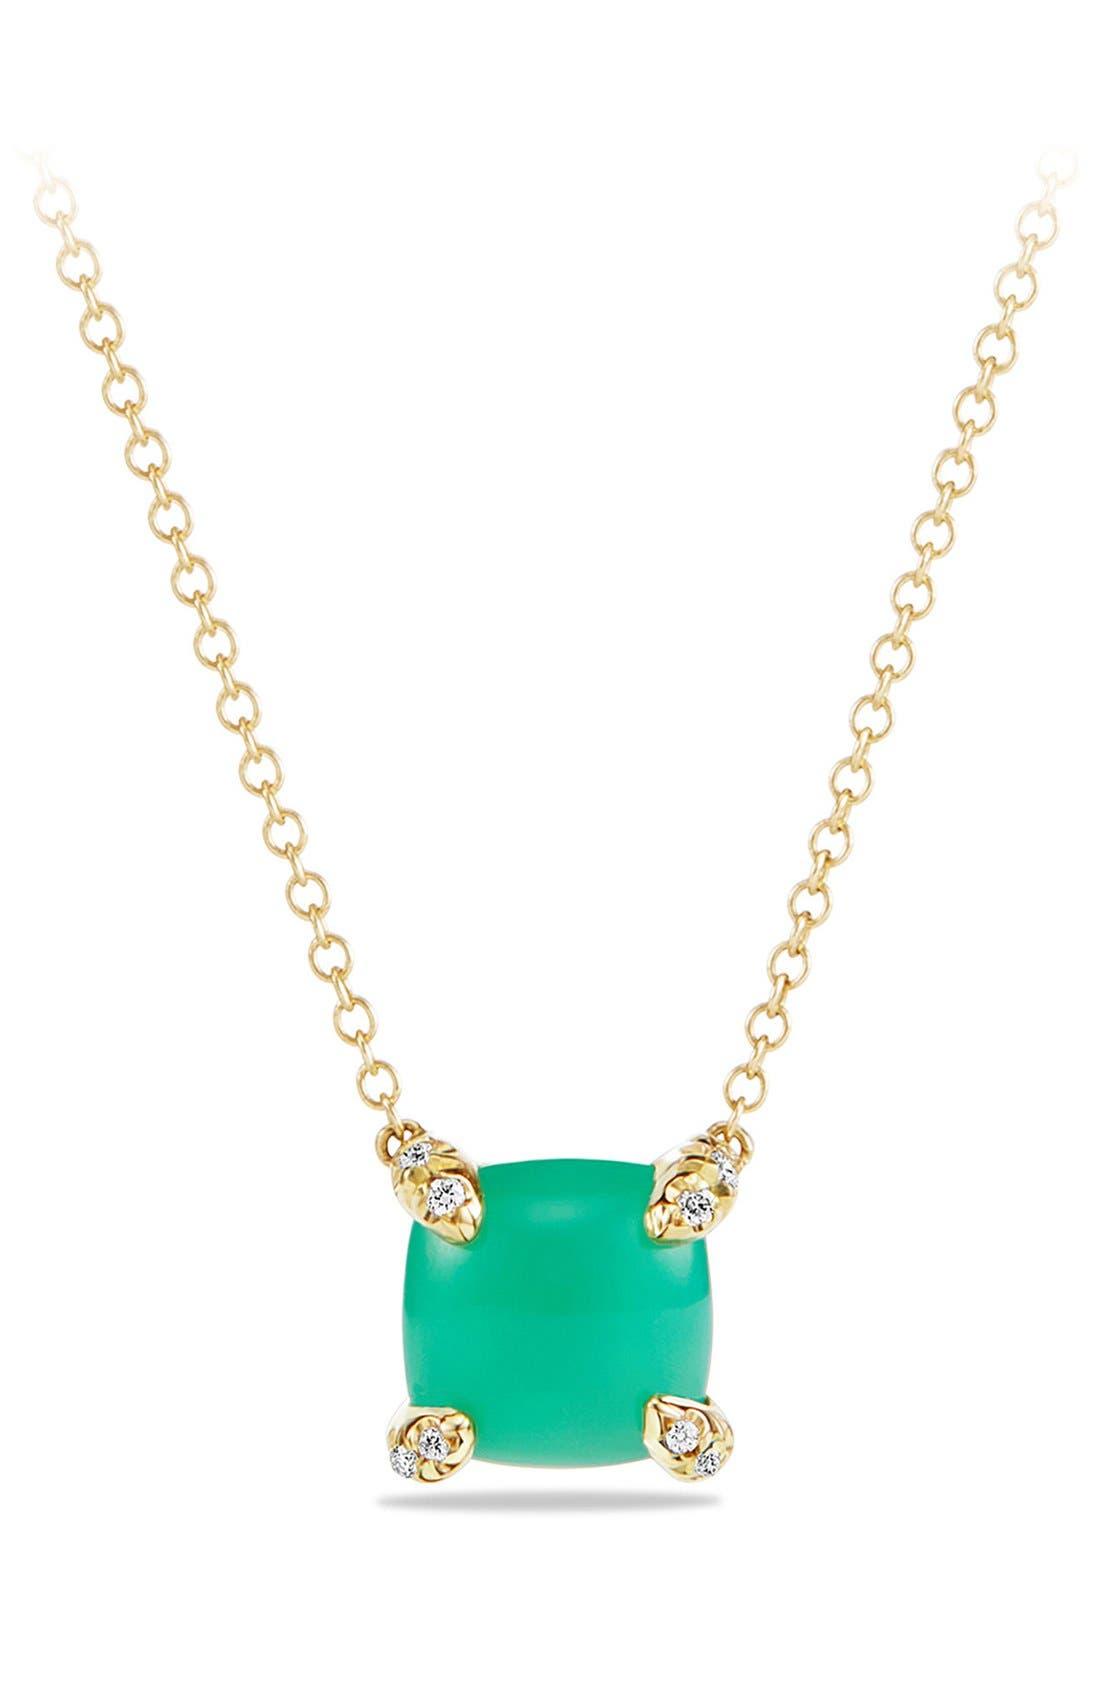 DAVID YURMAN 'Châtelaine' Pendant Necklace with Semiprecious